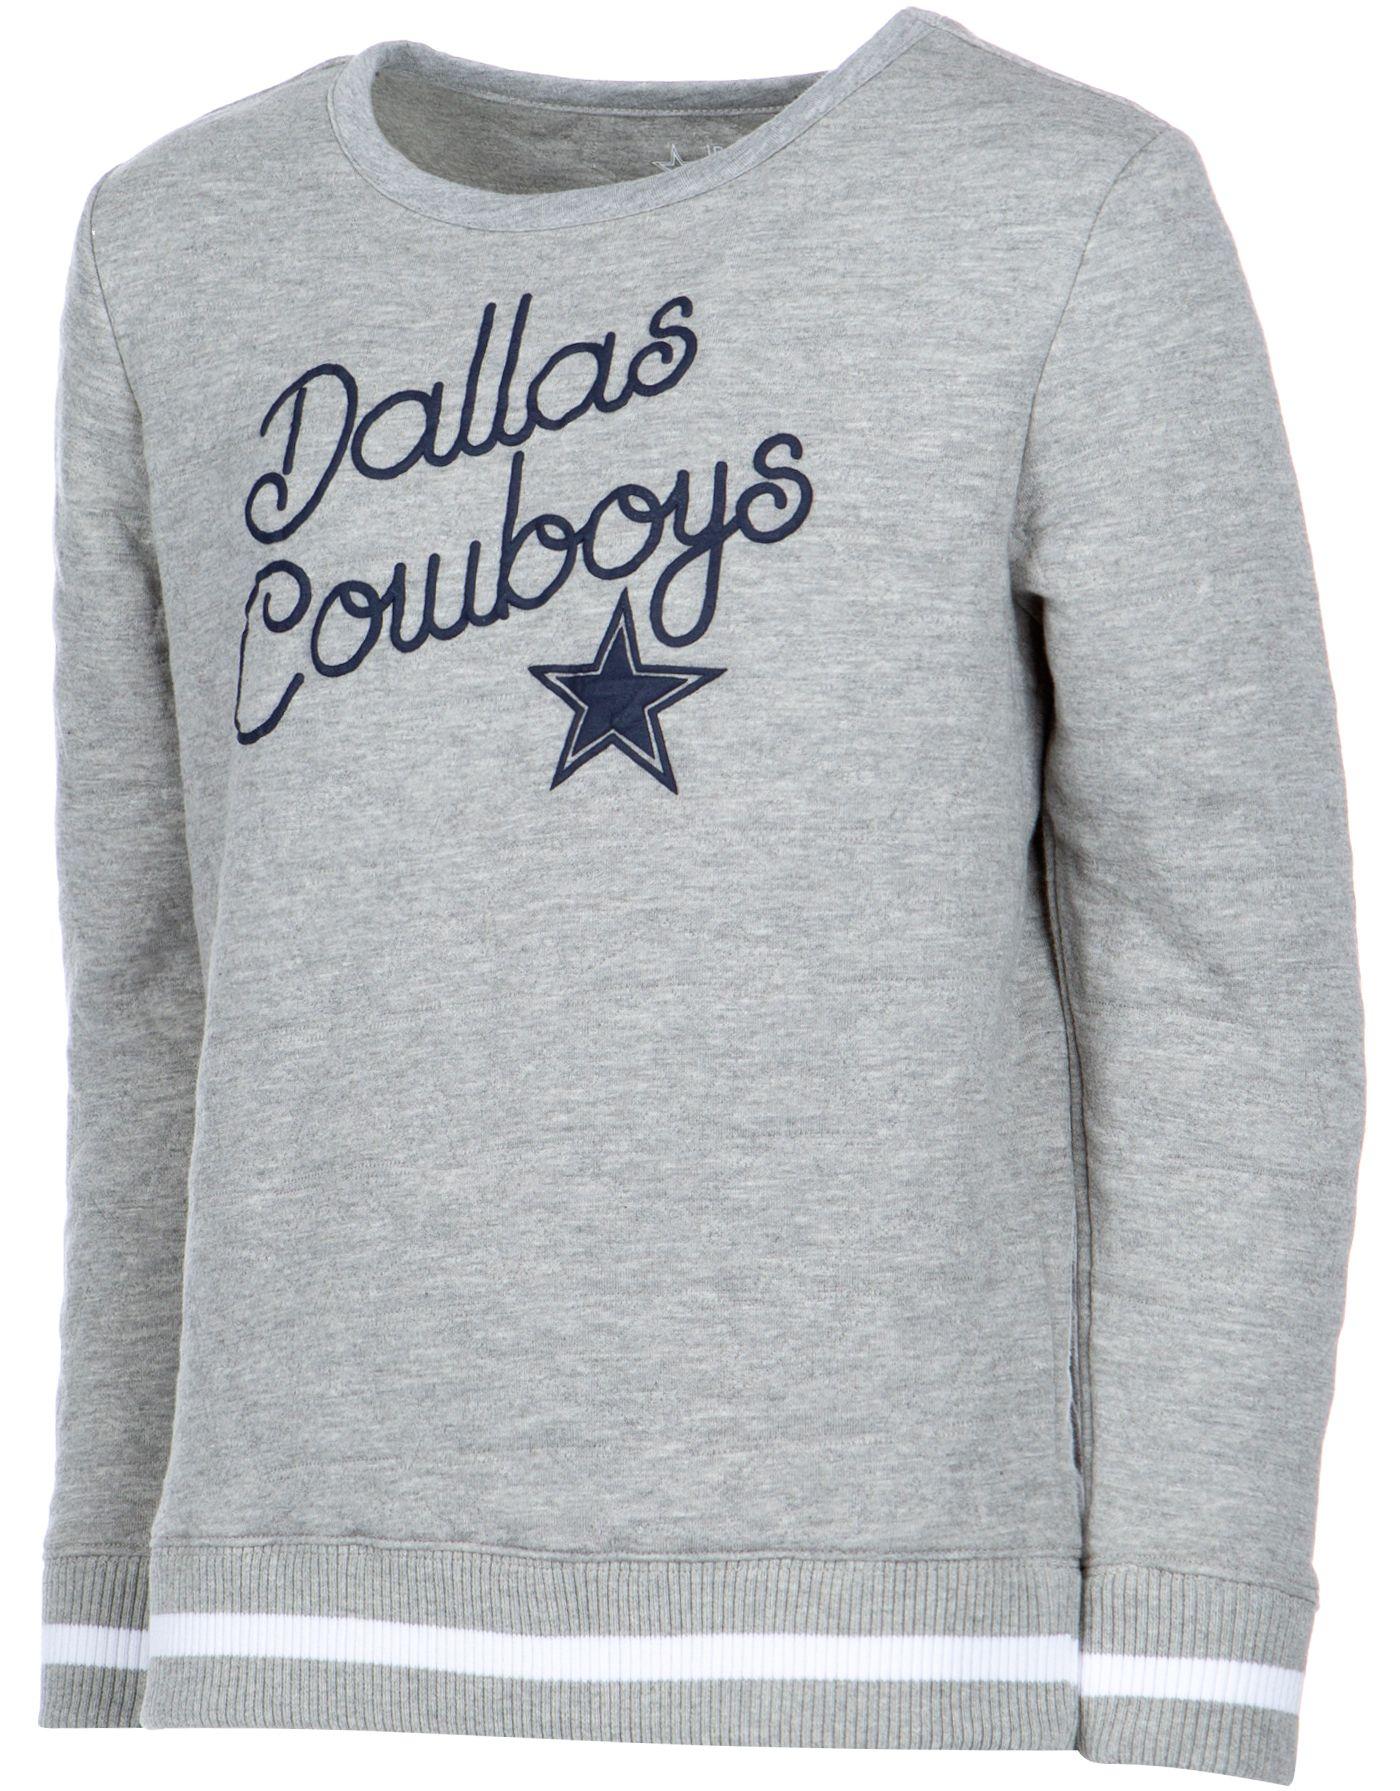 Dallas Cowboys Merchandising Girls' Star Quilted Crew